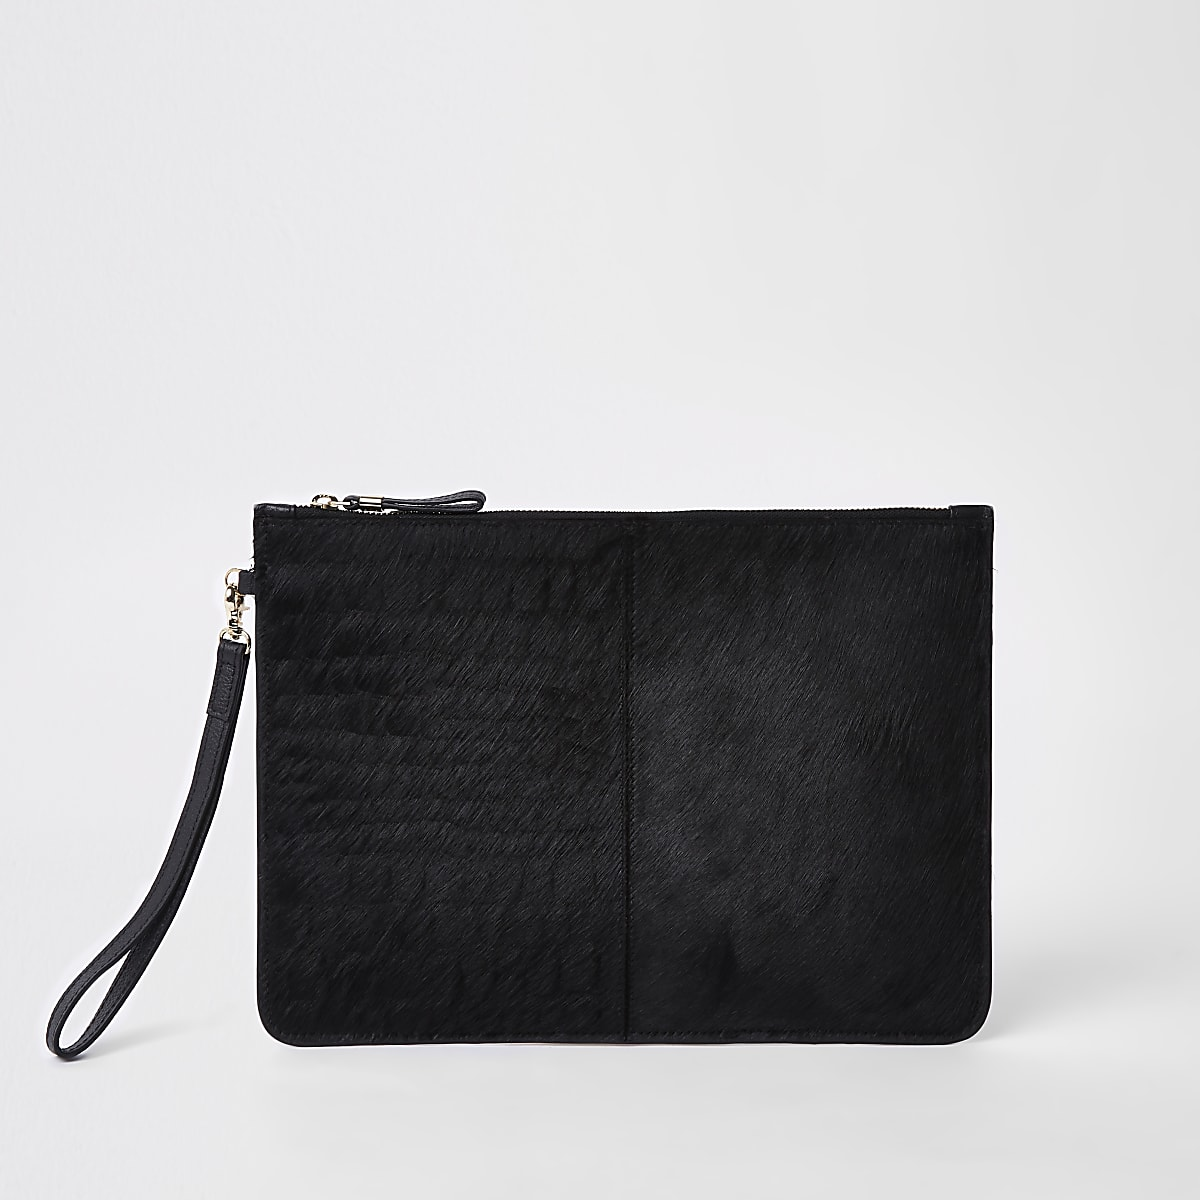 Schwarze Clutch aus Leder in Kroko-Optik